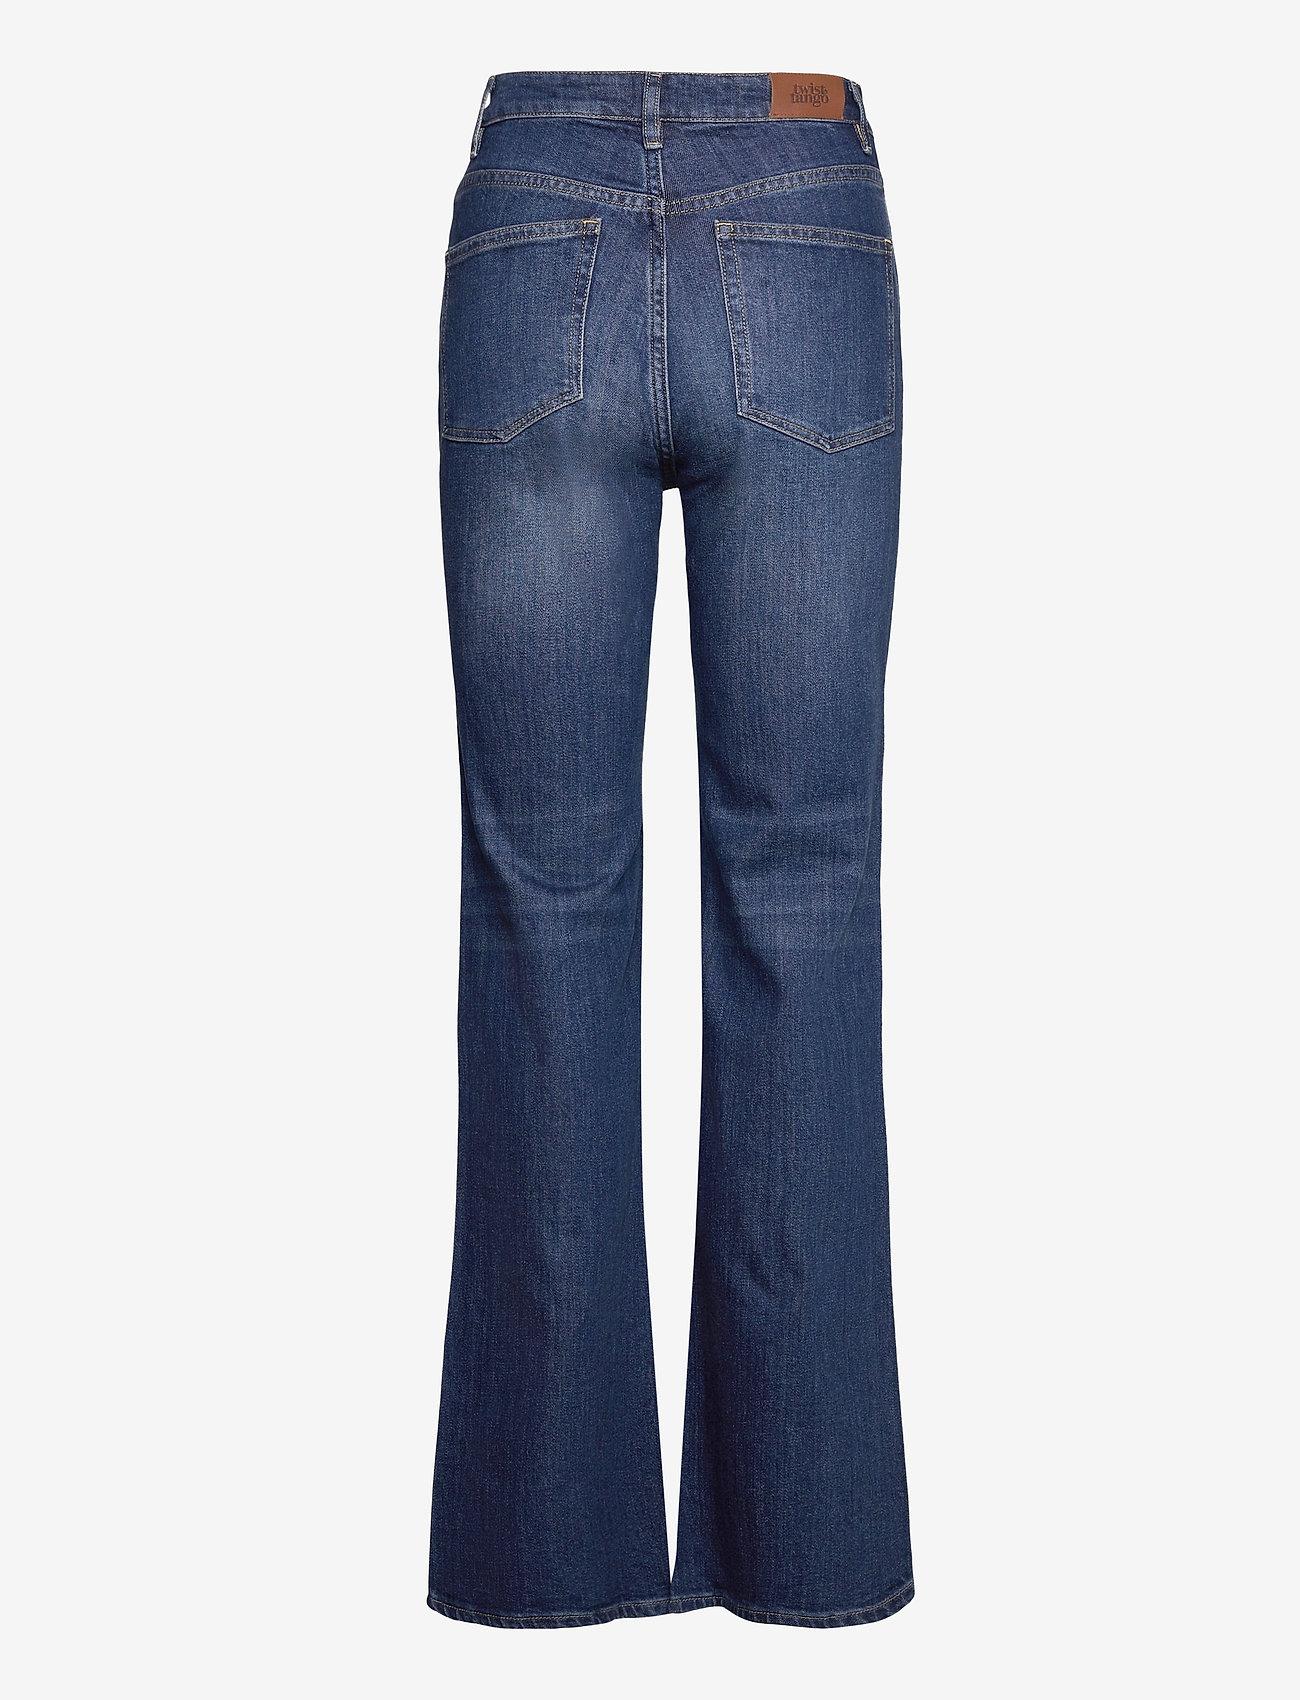 Twist & Tango - Lo Flare Jeans - utsvängda jeans - dk blue wash - 1